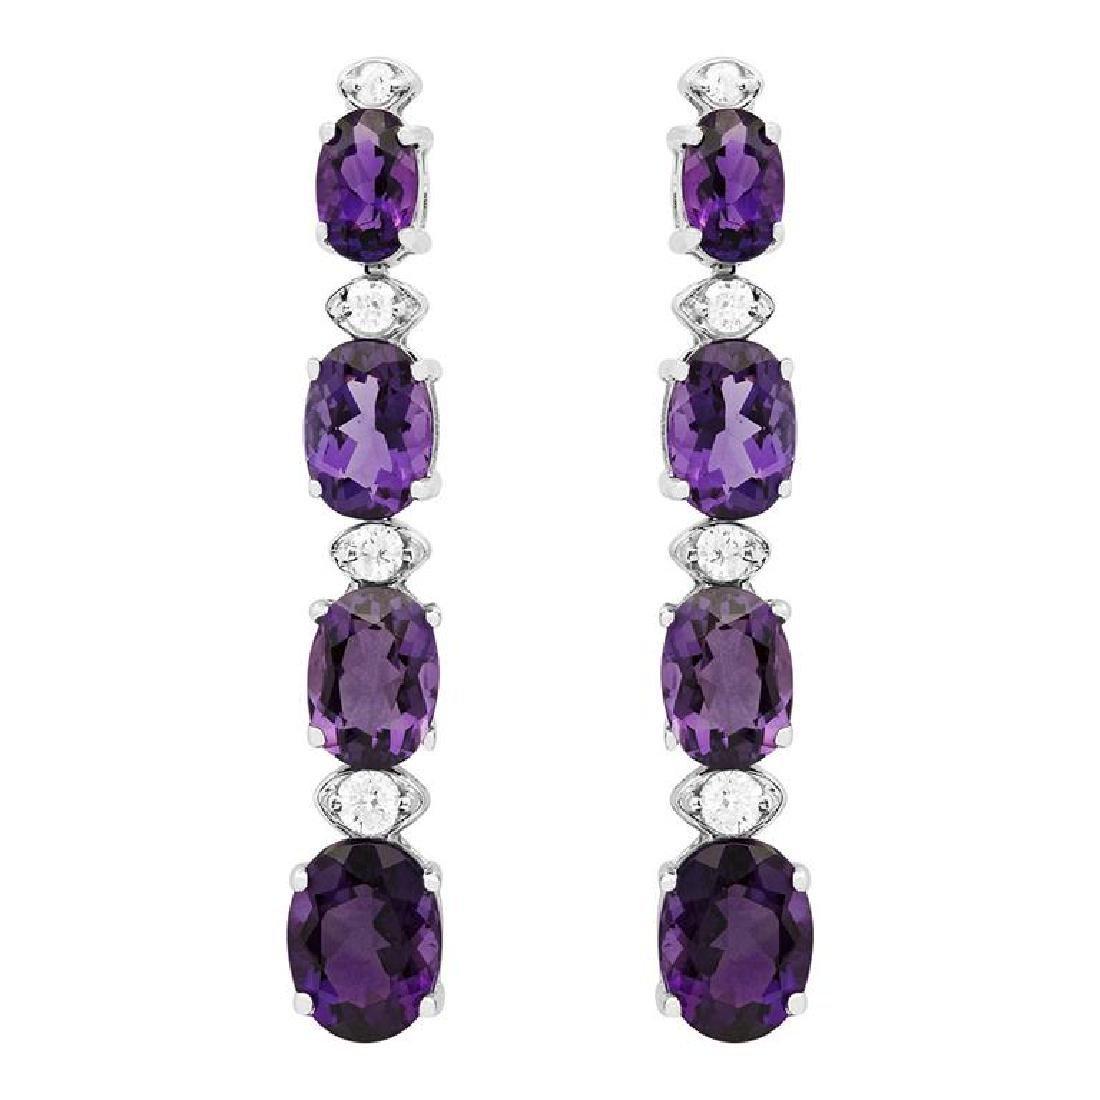 14k White Gold 6.38ct Amethyst 0.34ct Diamond Earrings